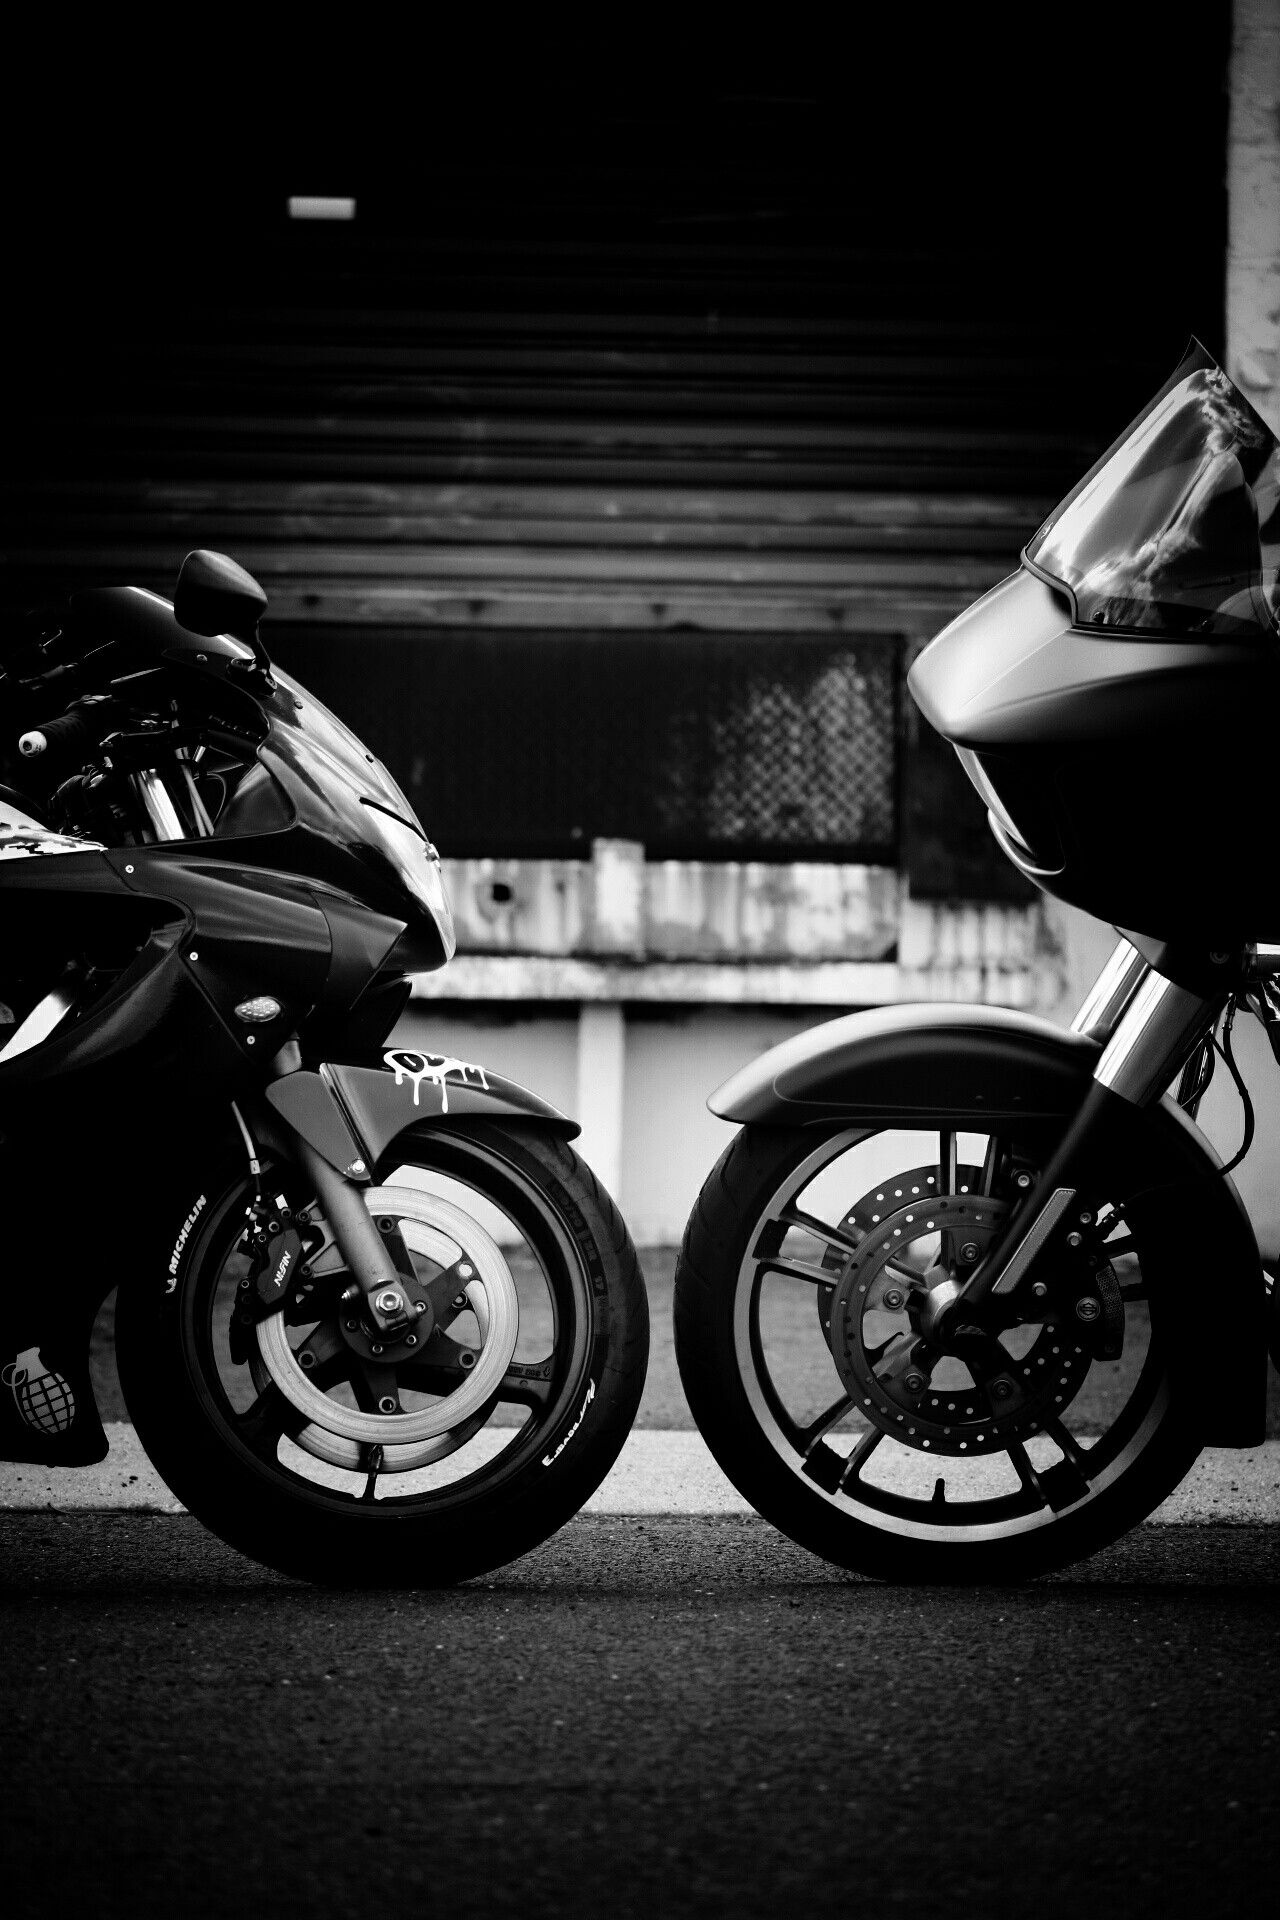 Honda vs harley